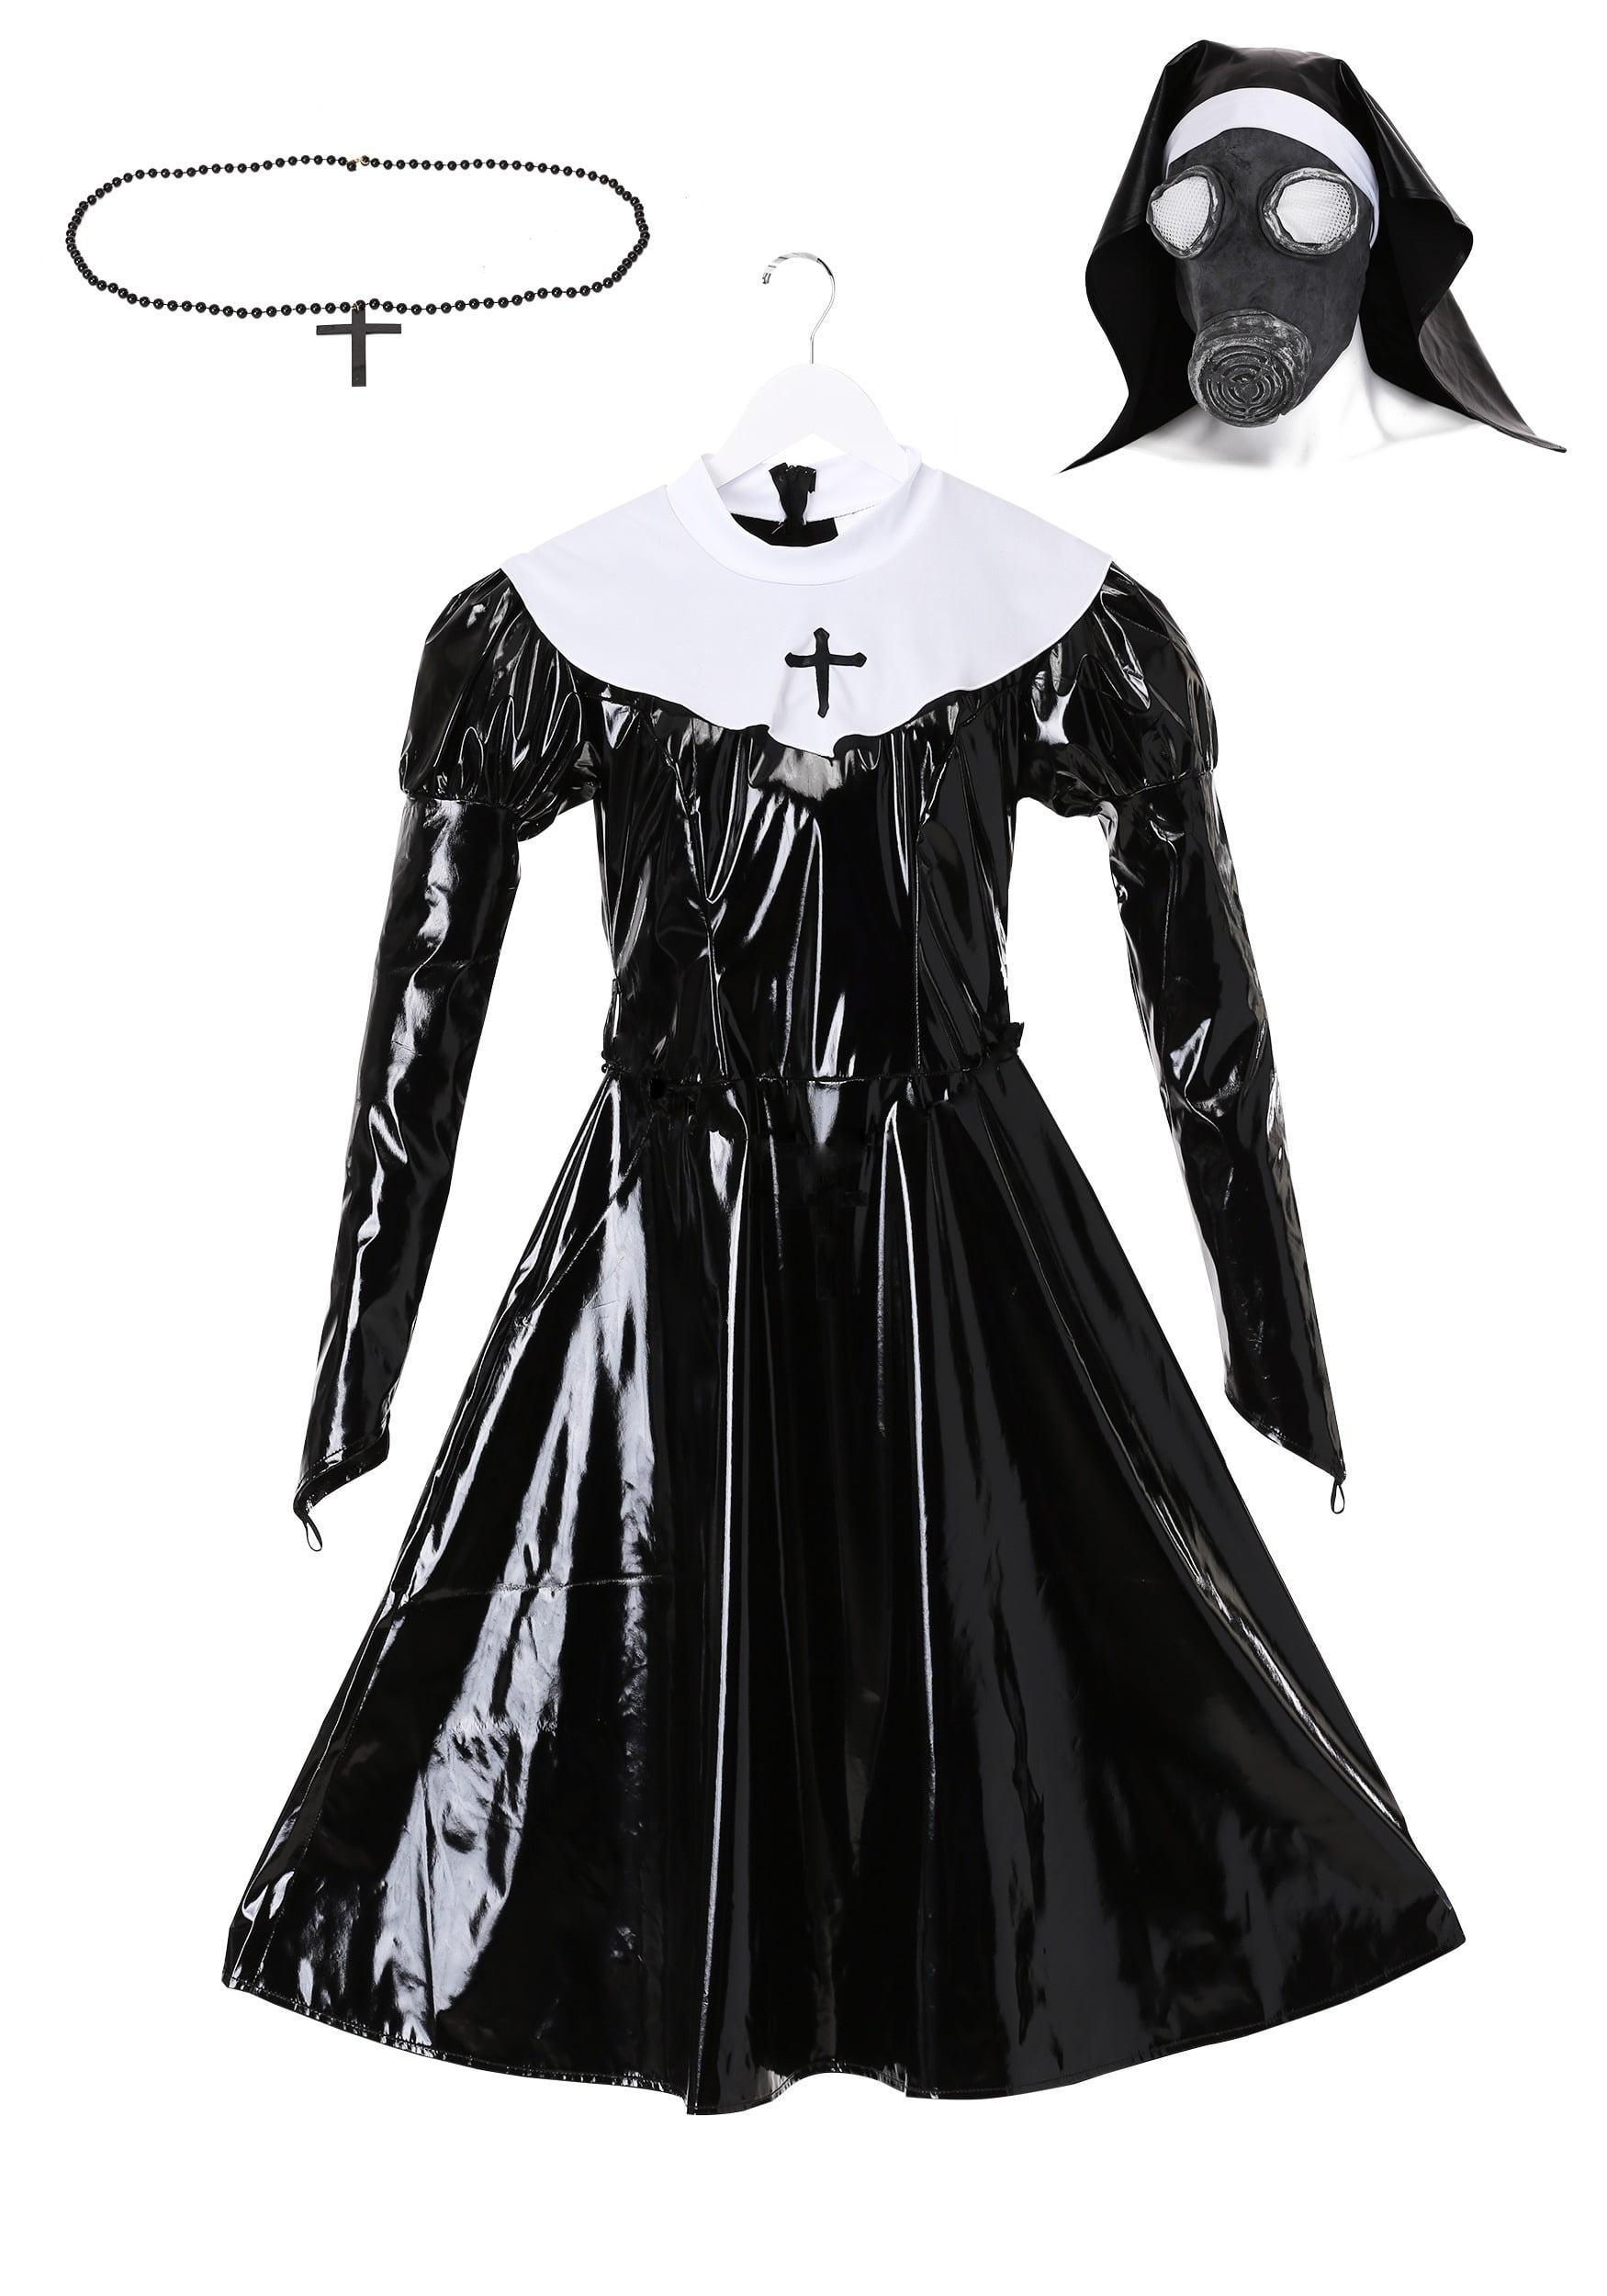 Nun Kit Catholic Church Habit Fancy Dress Up Halloween Adult Costume Accessory